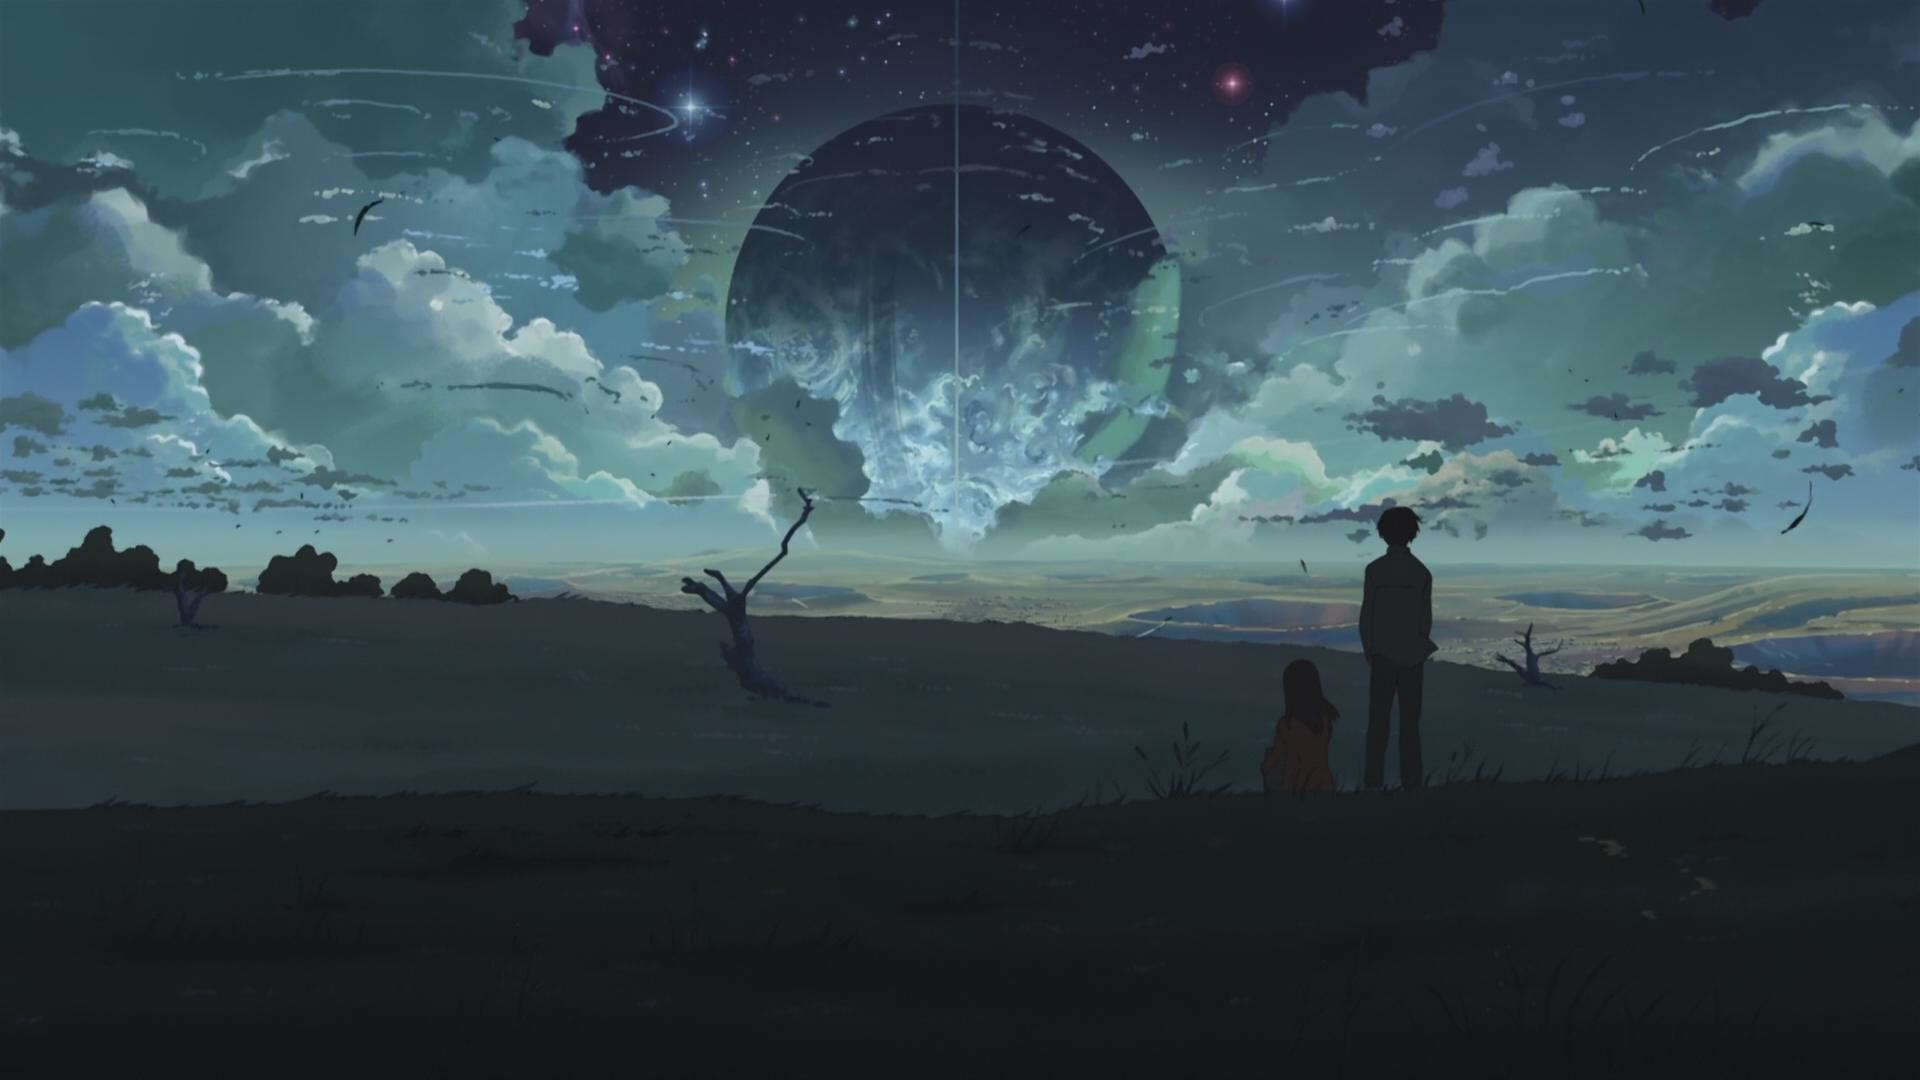 gloomy-anime-future-wallpaper-1920×1080.jpg